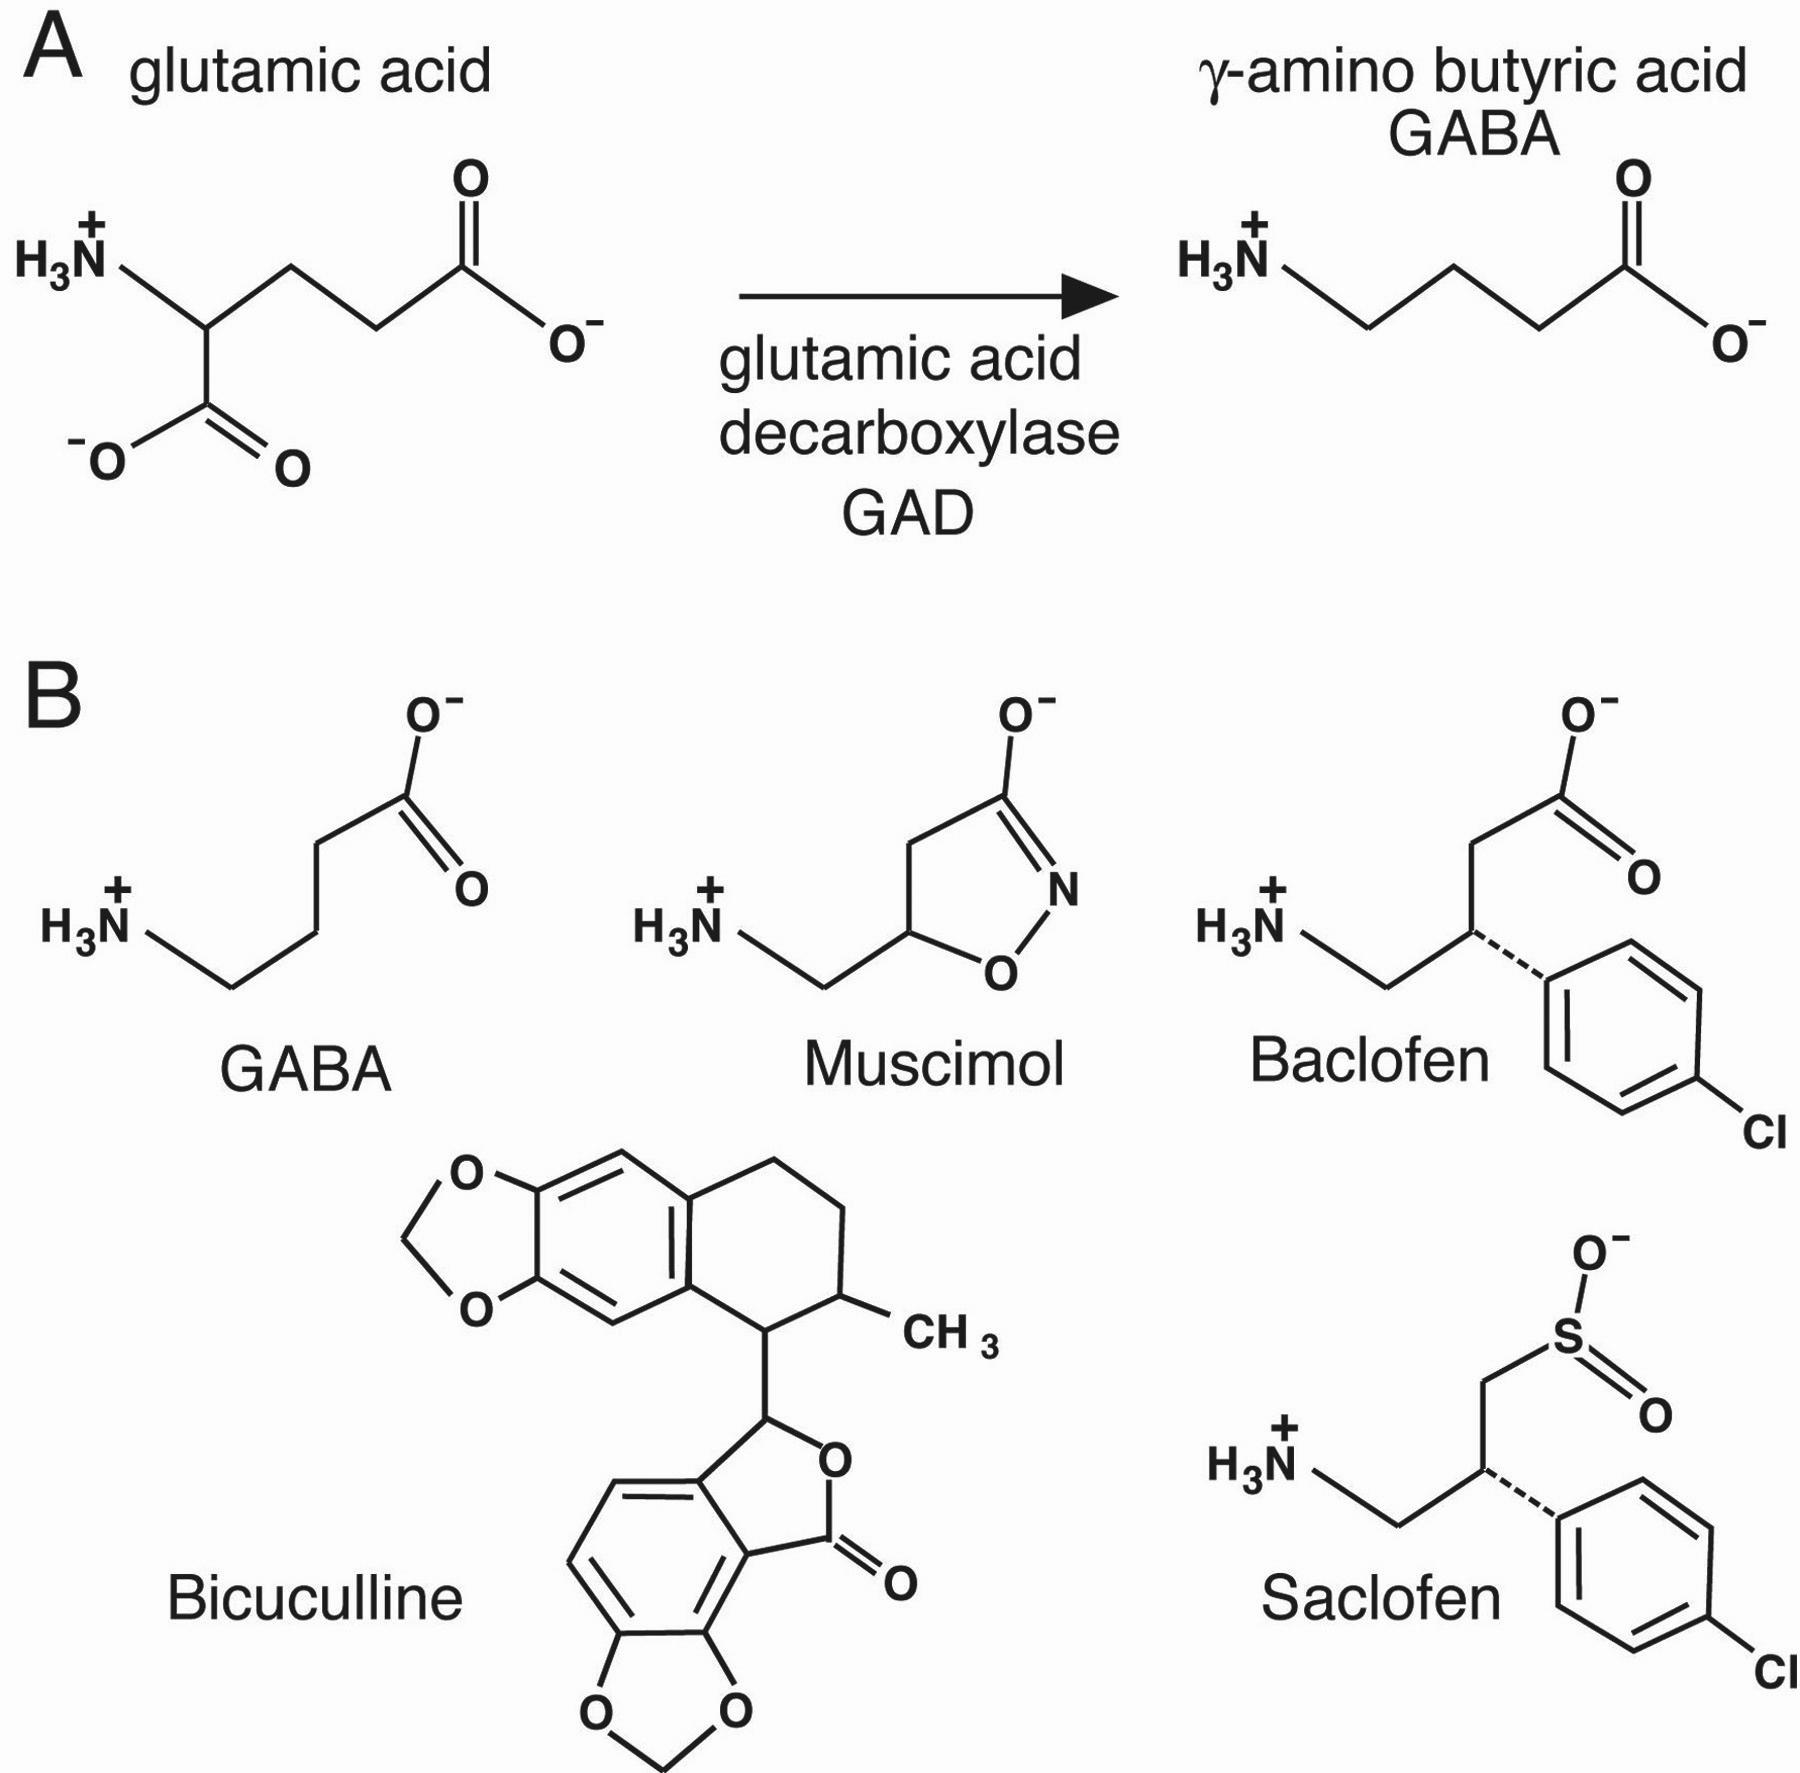 glutamate decarboxylase